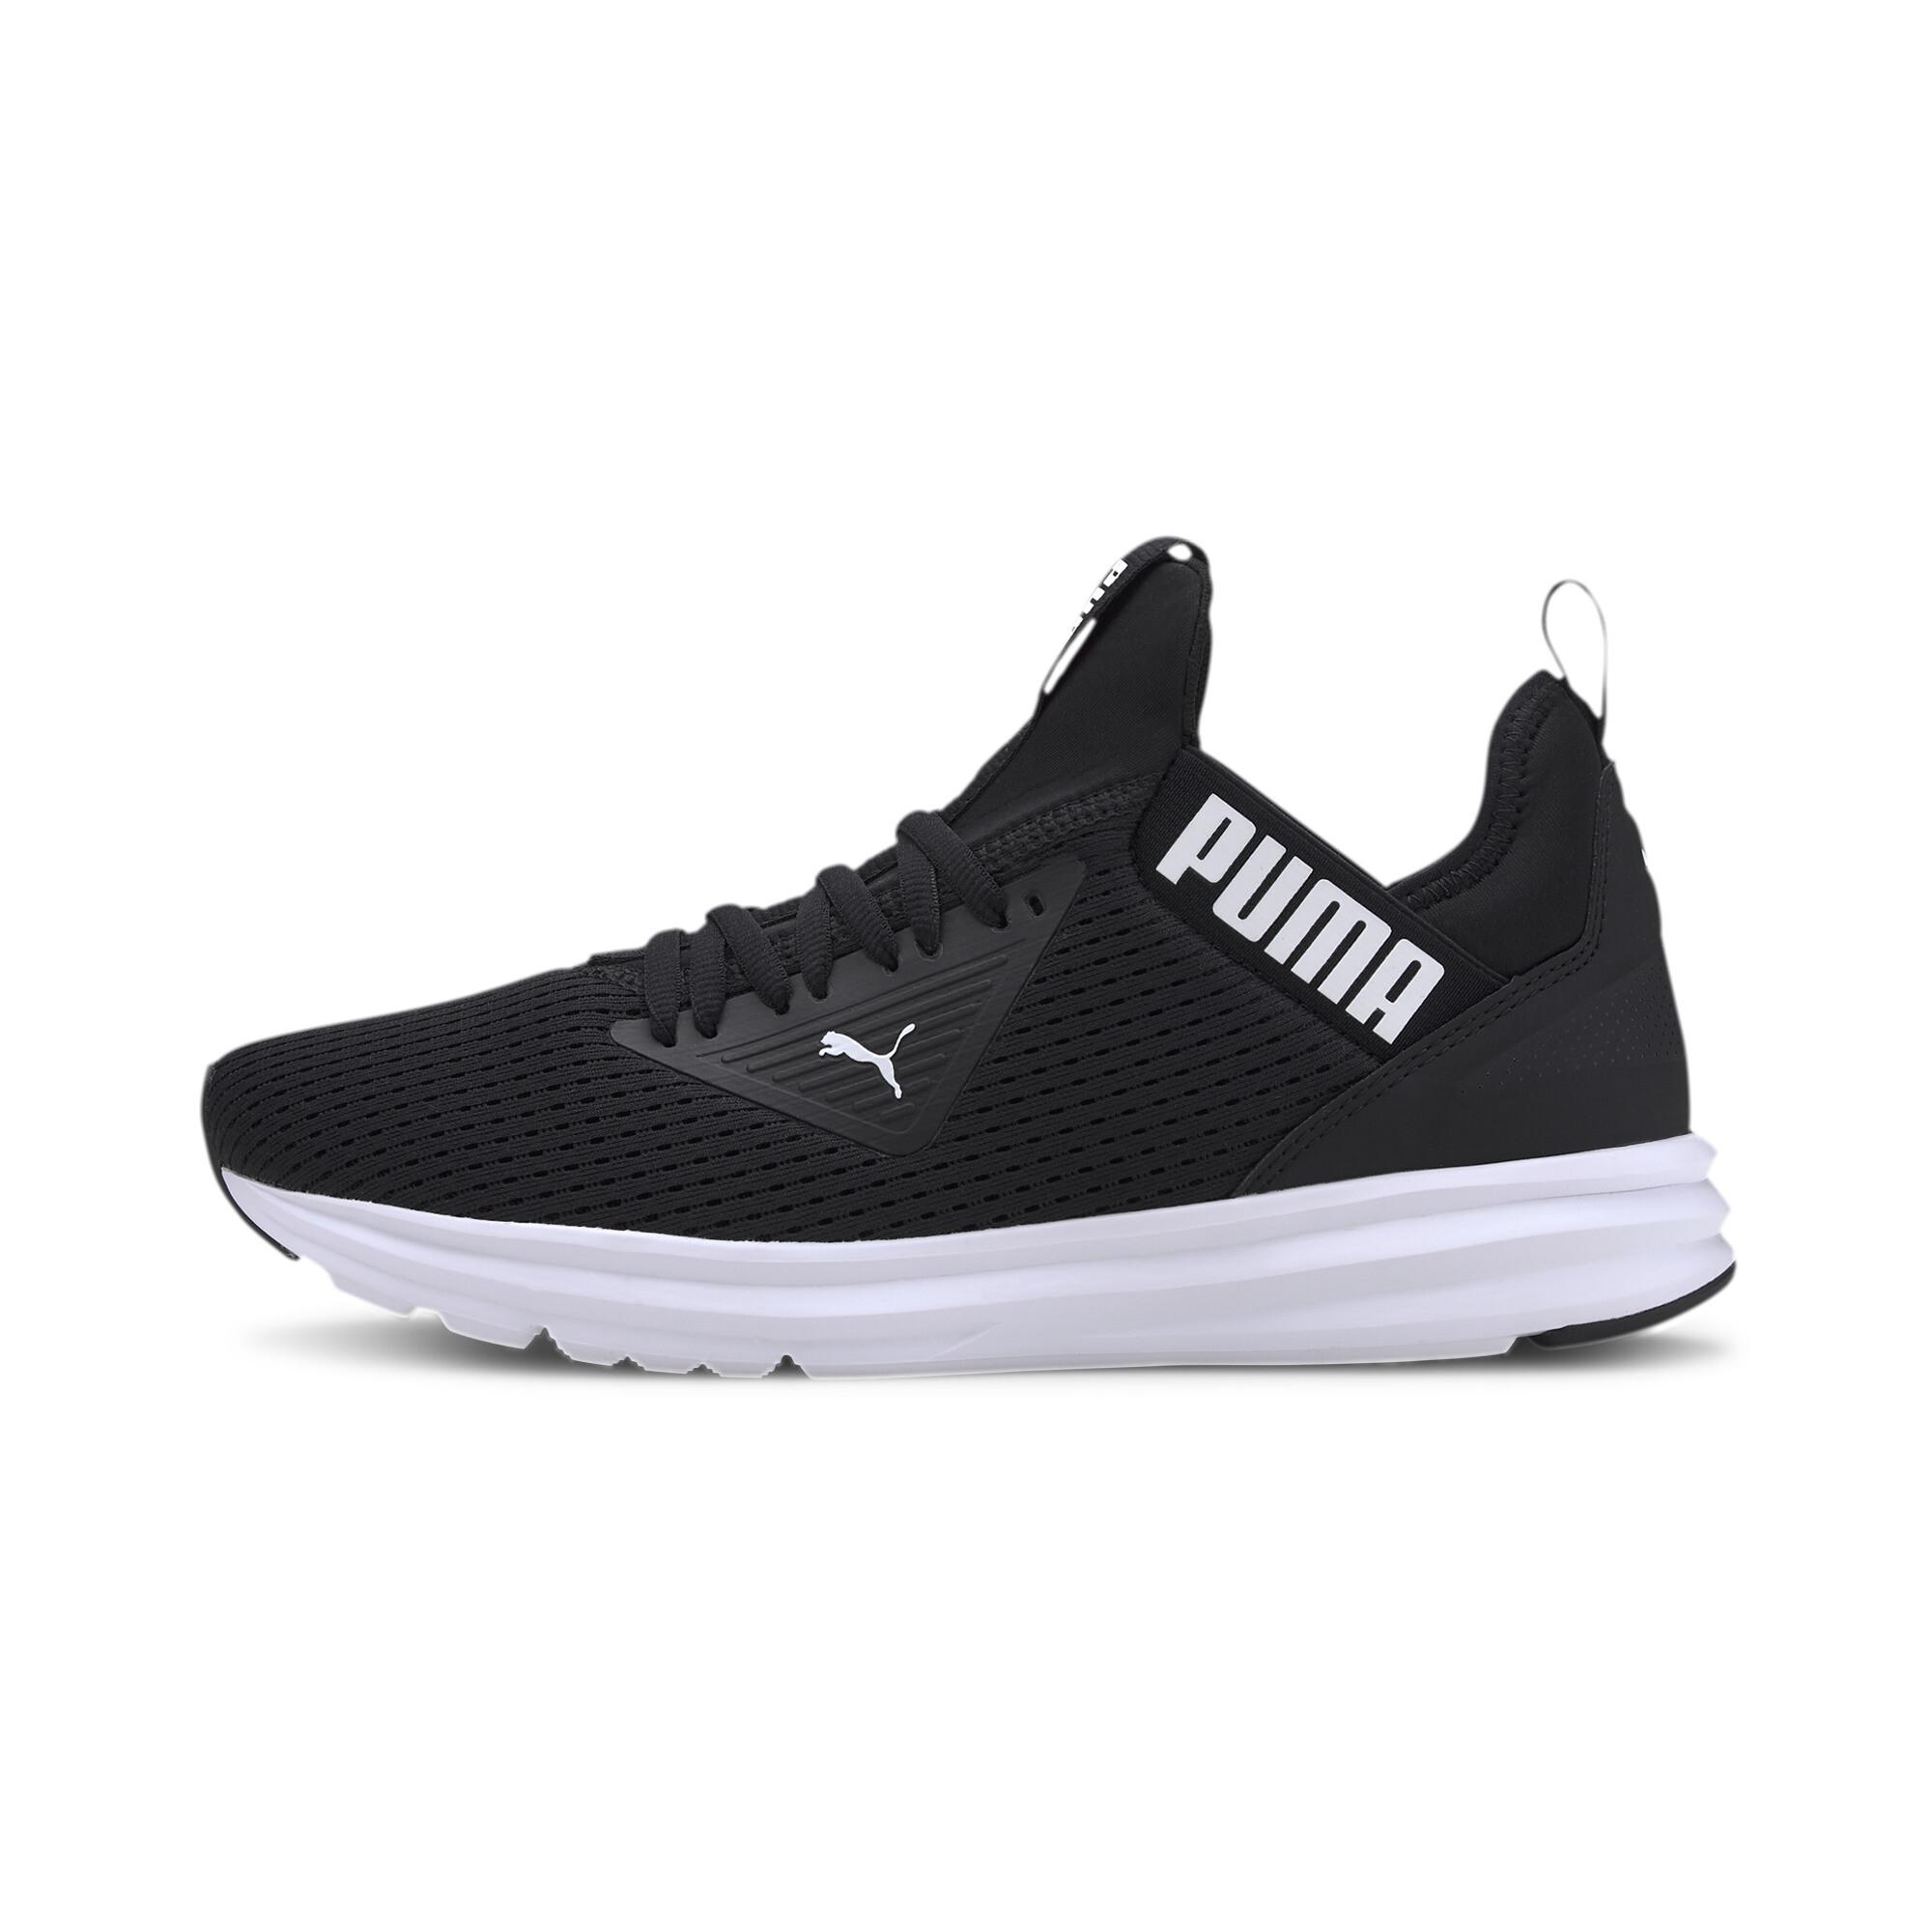 PUMA-Men-039-s-Enzo-Beta-Mesh-Training-Shoes thumbnail 4